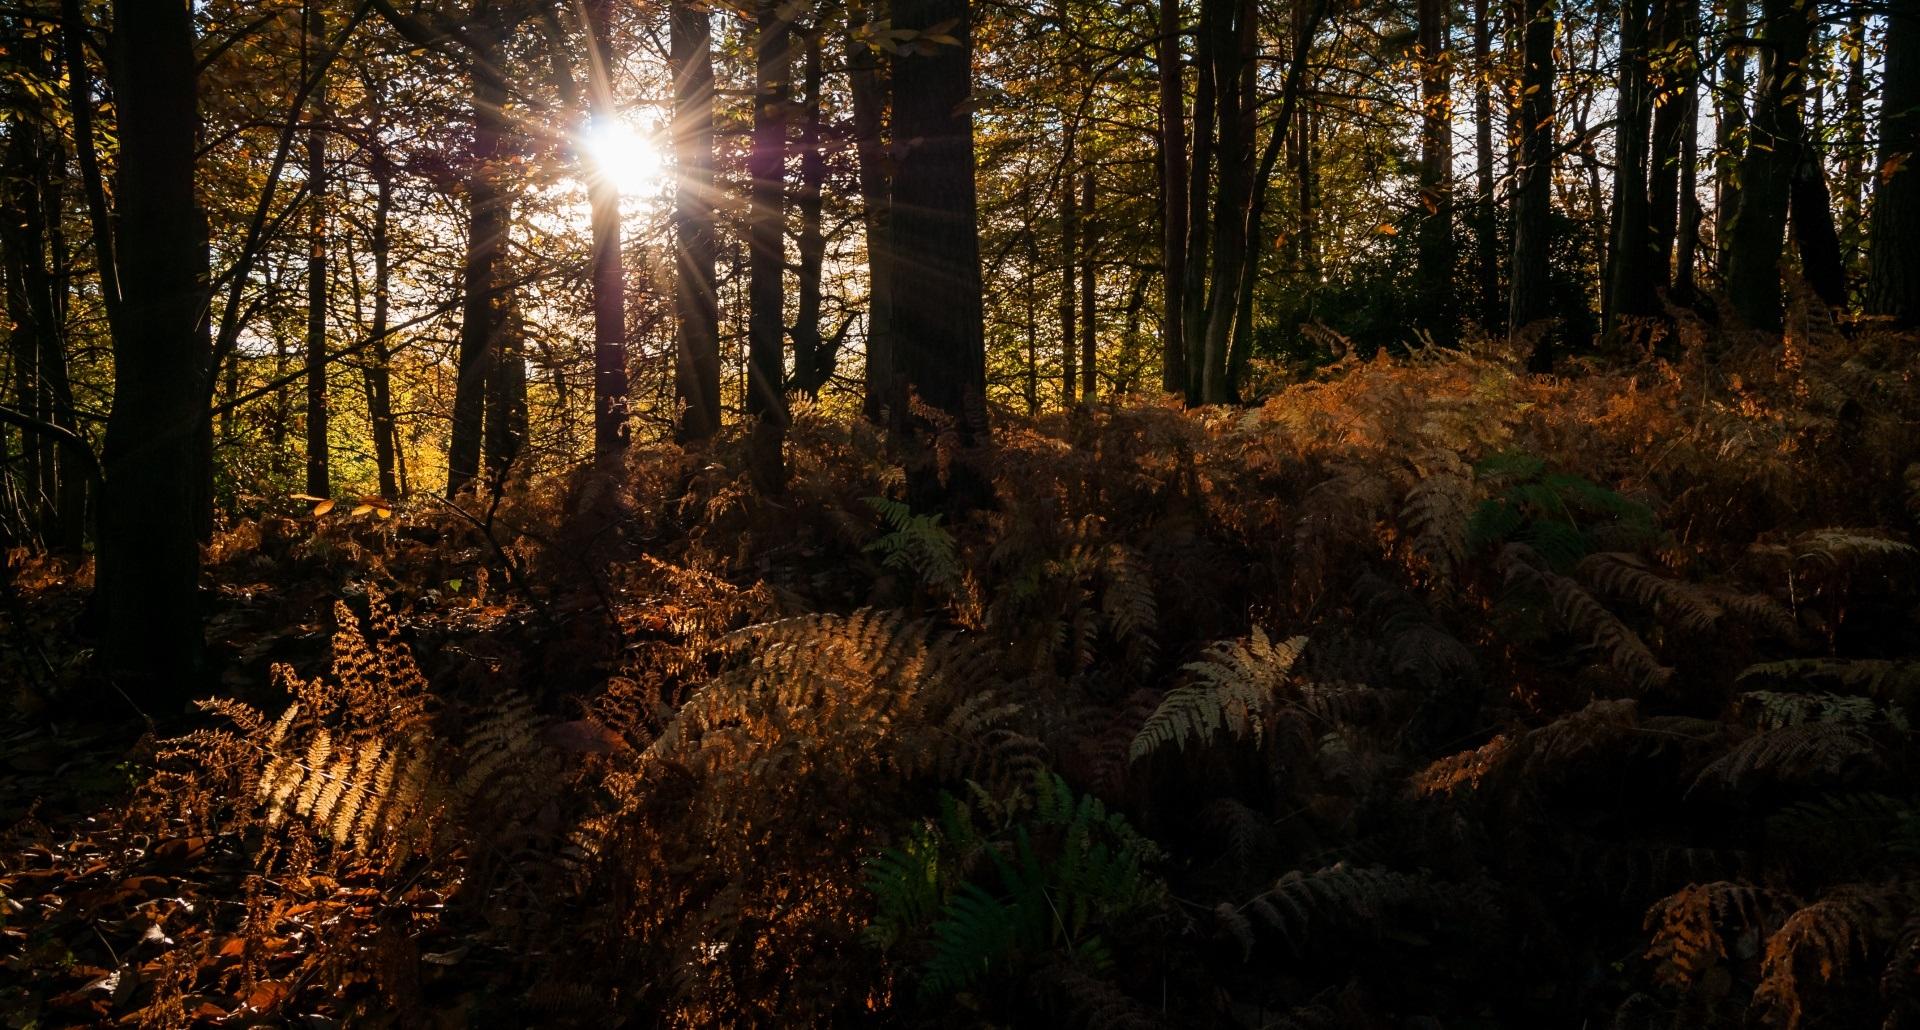 autumn_rays-wallpaper-1920x1080